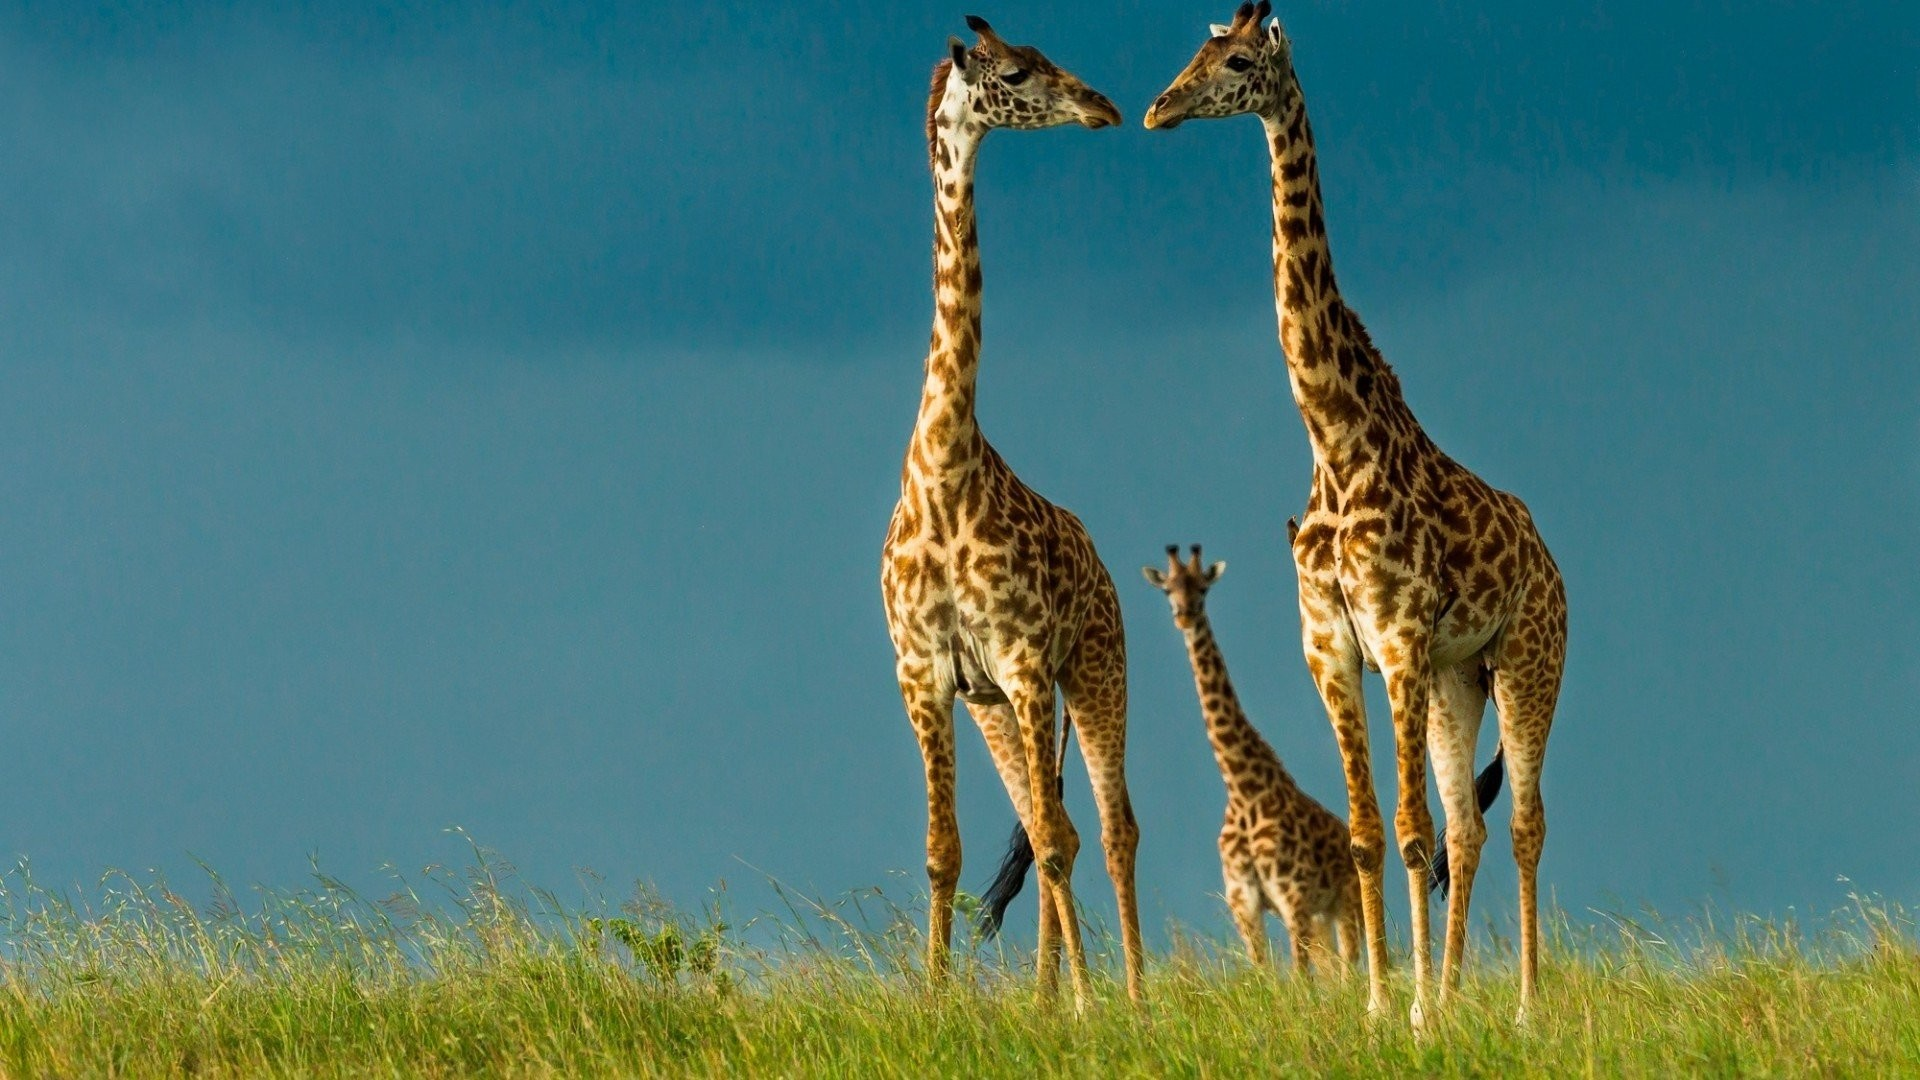 Beauty cute amazing animal Animal Giraffe Family wallpaper      893744   WallpaperUP